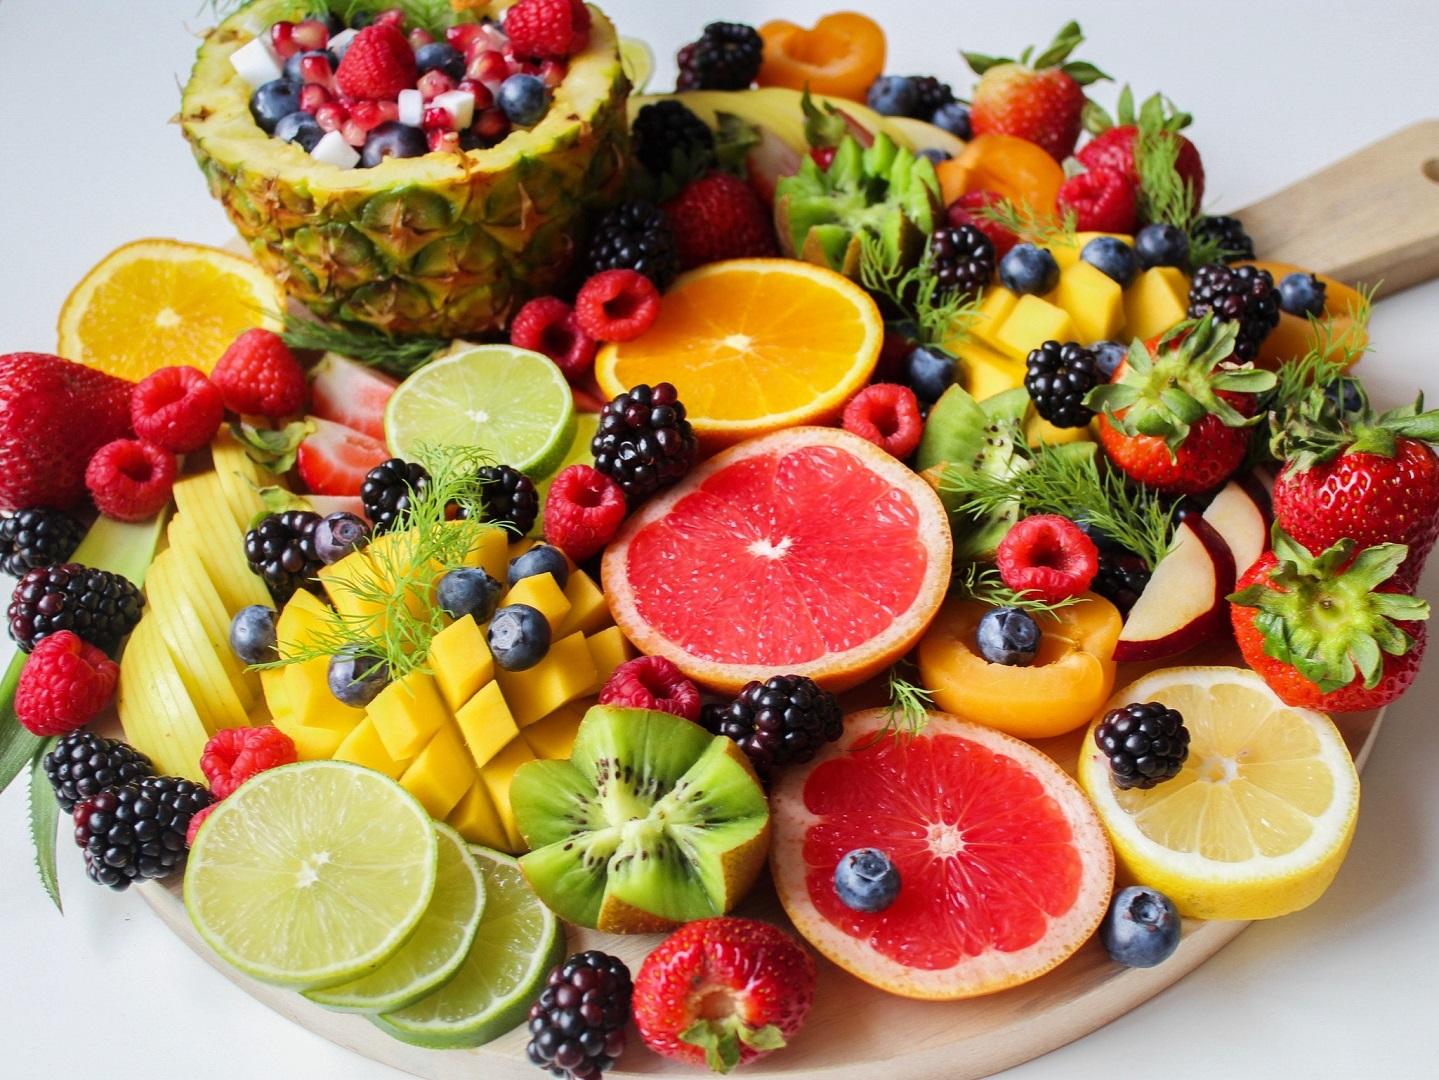 Benefits of eating fresh fruits